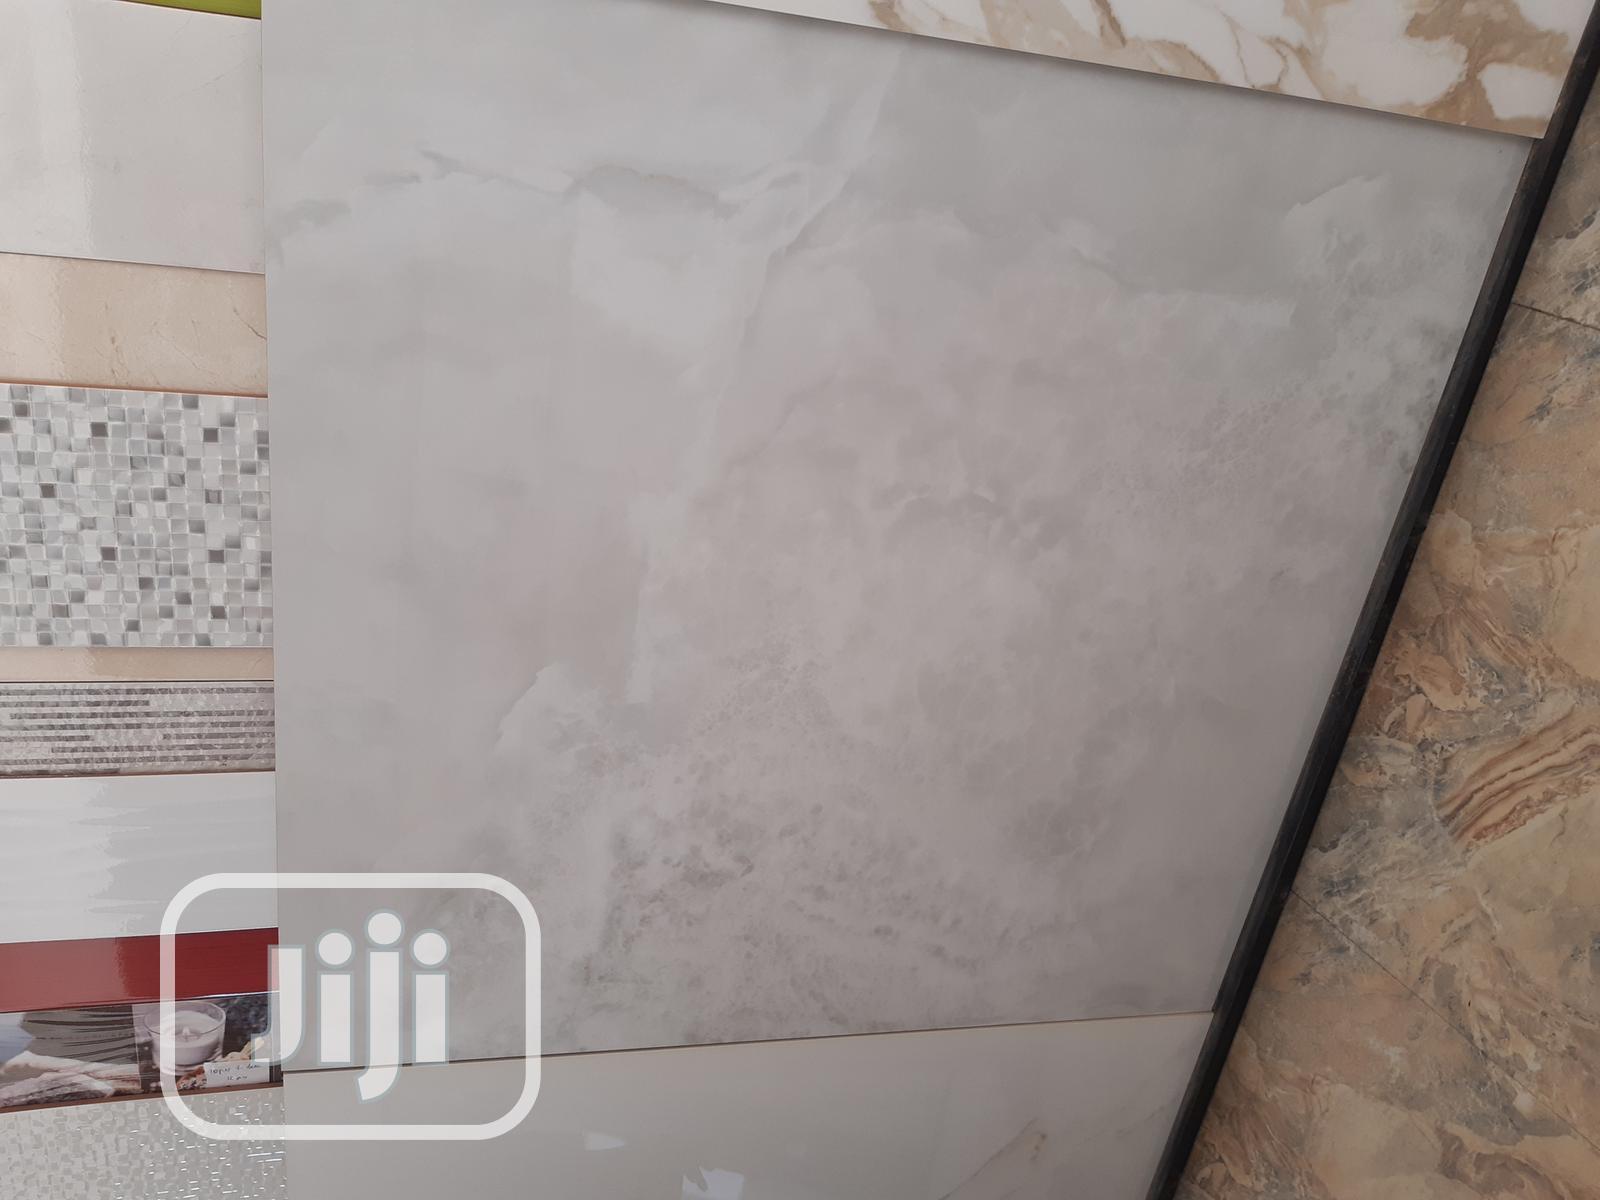 120 By 120 Super Polish Spanish Floor | Building Materials for sale in Dei-Dei, Abuja (FCT) State, Nigeria